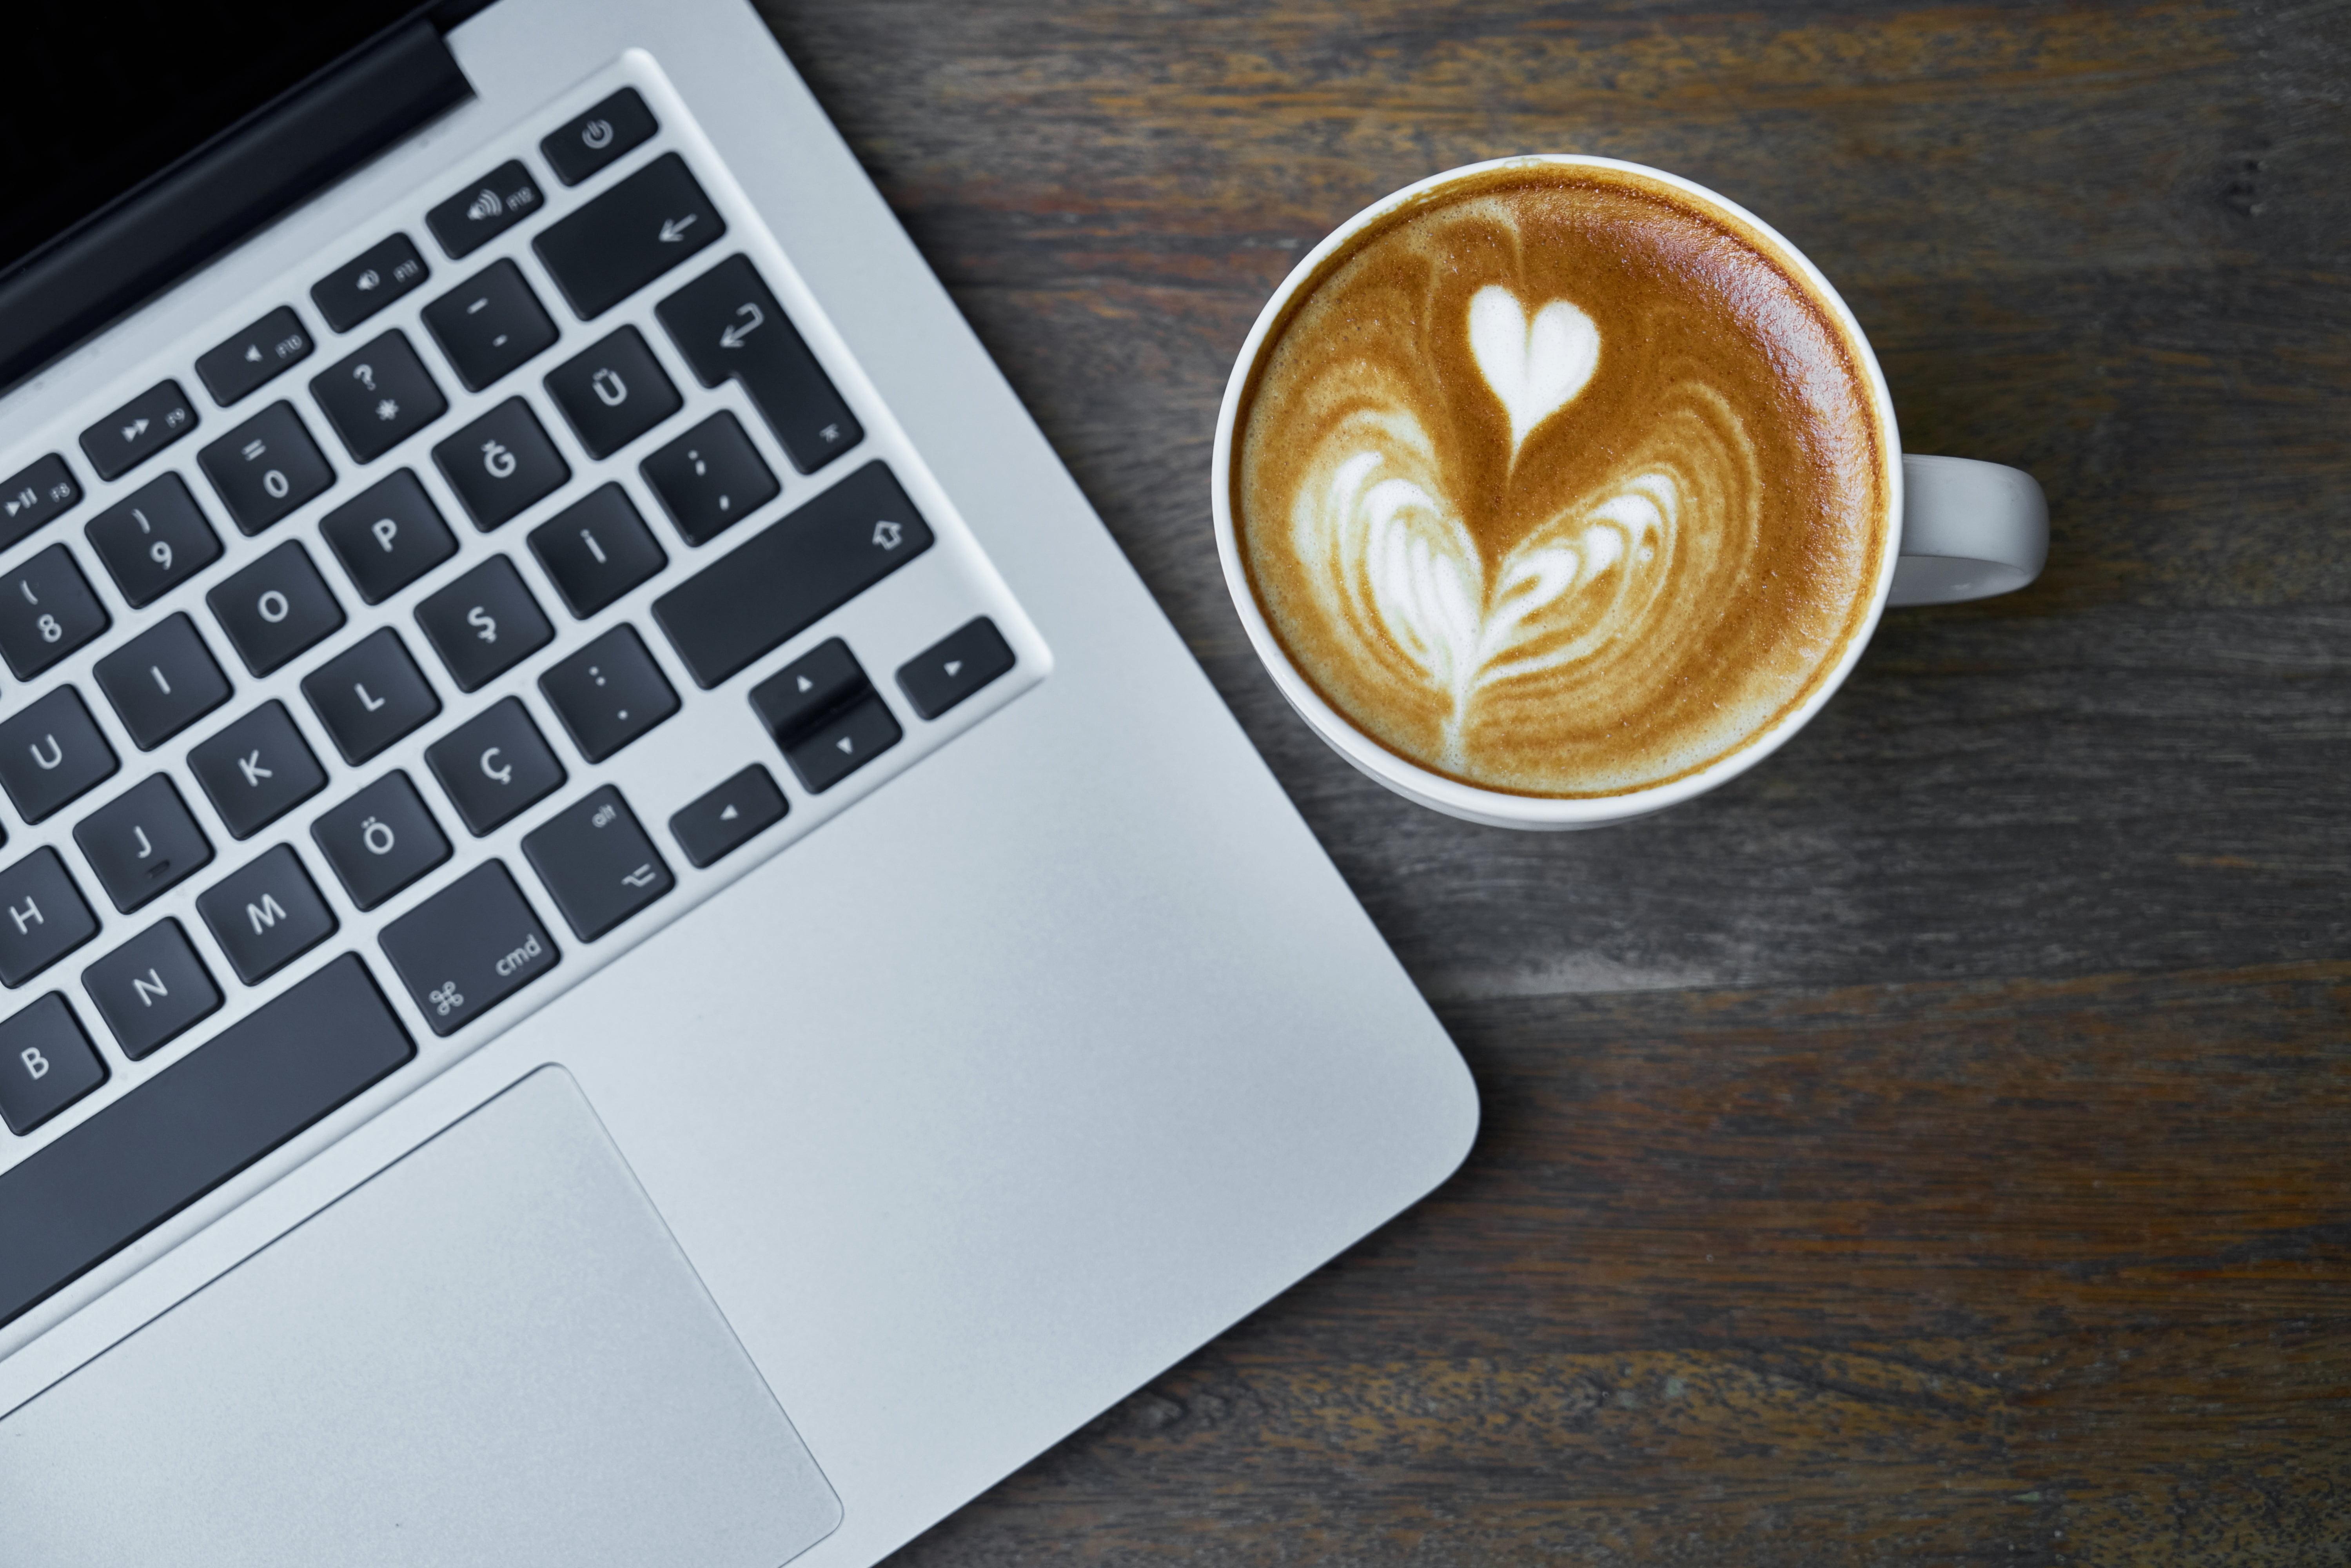 MacBook Pro beside white ceramic mug with espresso HD wallpaper ...